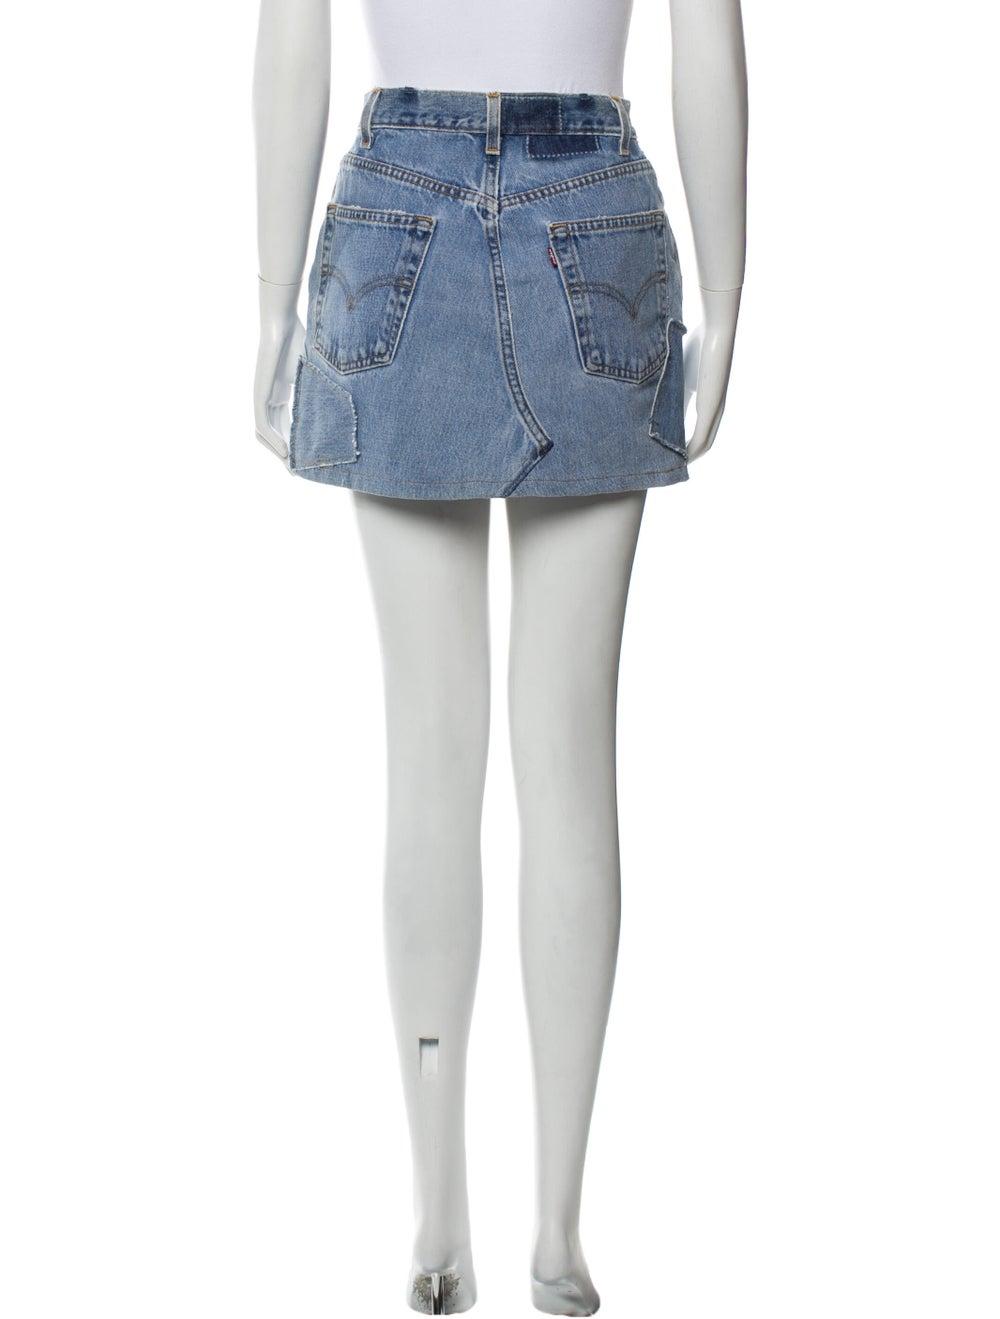 Reformation Mini Skirt Blue - image 3